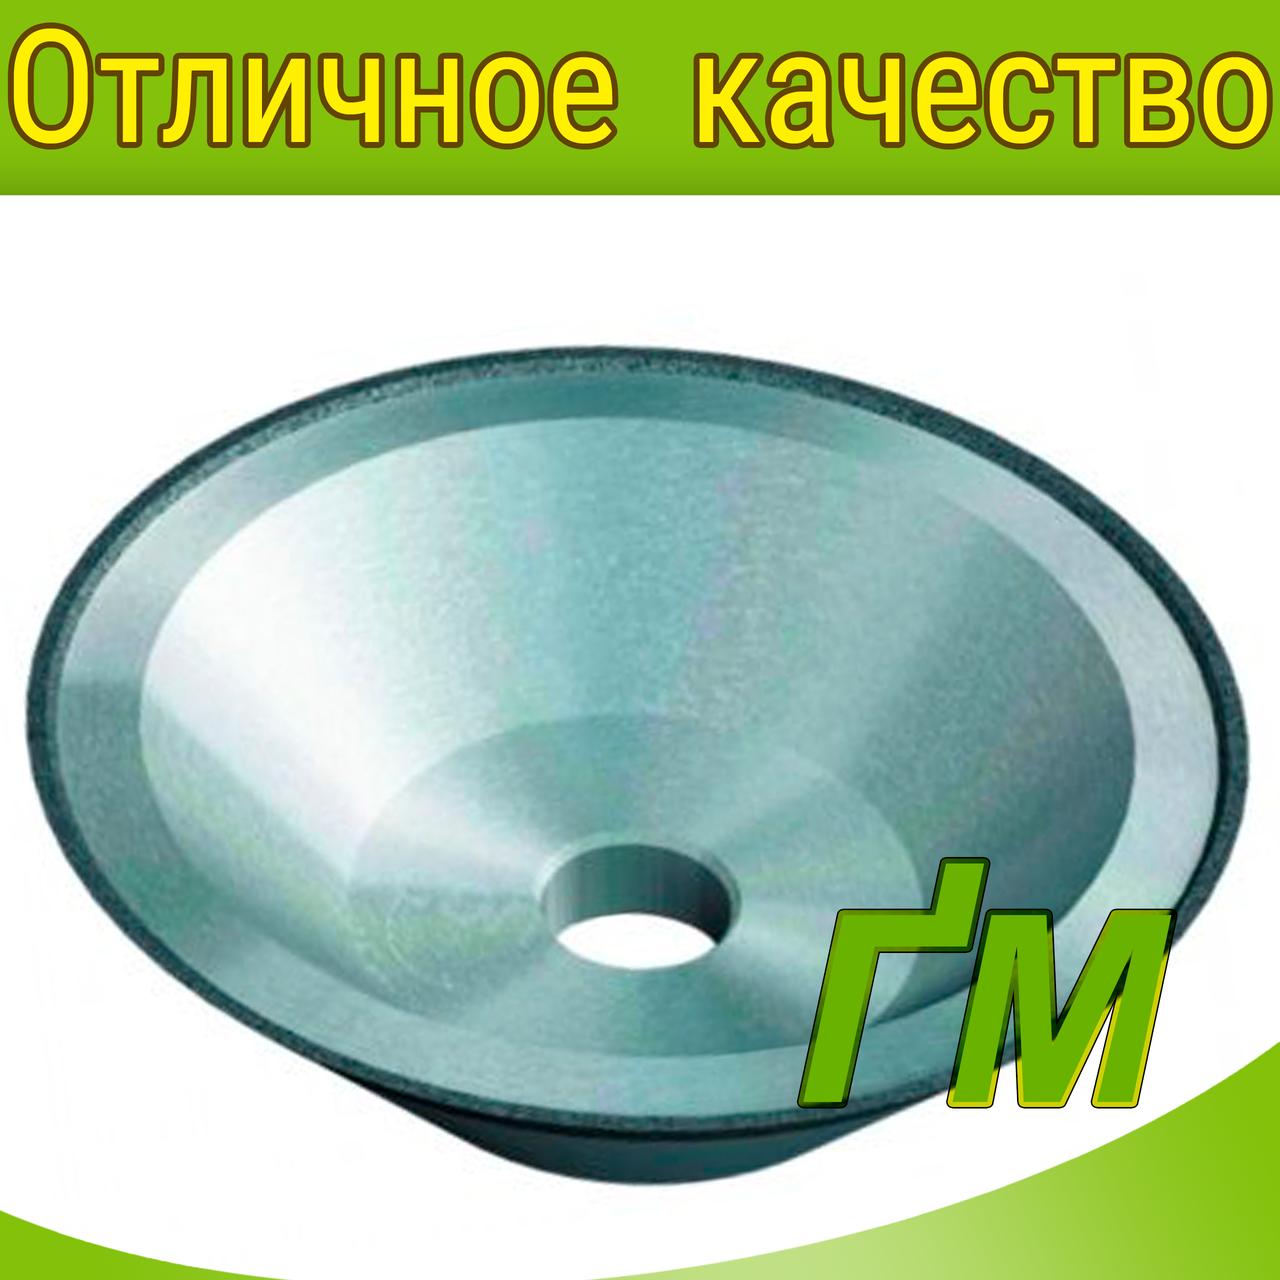 Круг алмазный чашечный конический 12А2-45 Ф 75х6х3х21х16 АСМ 80/63 100% В2-01